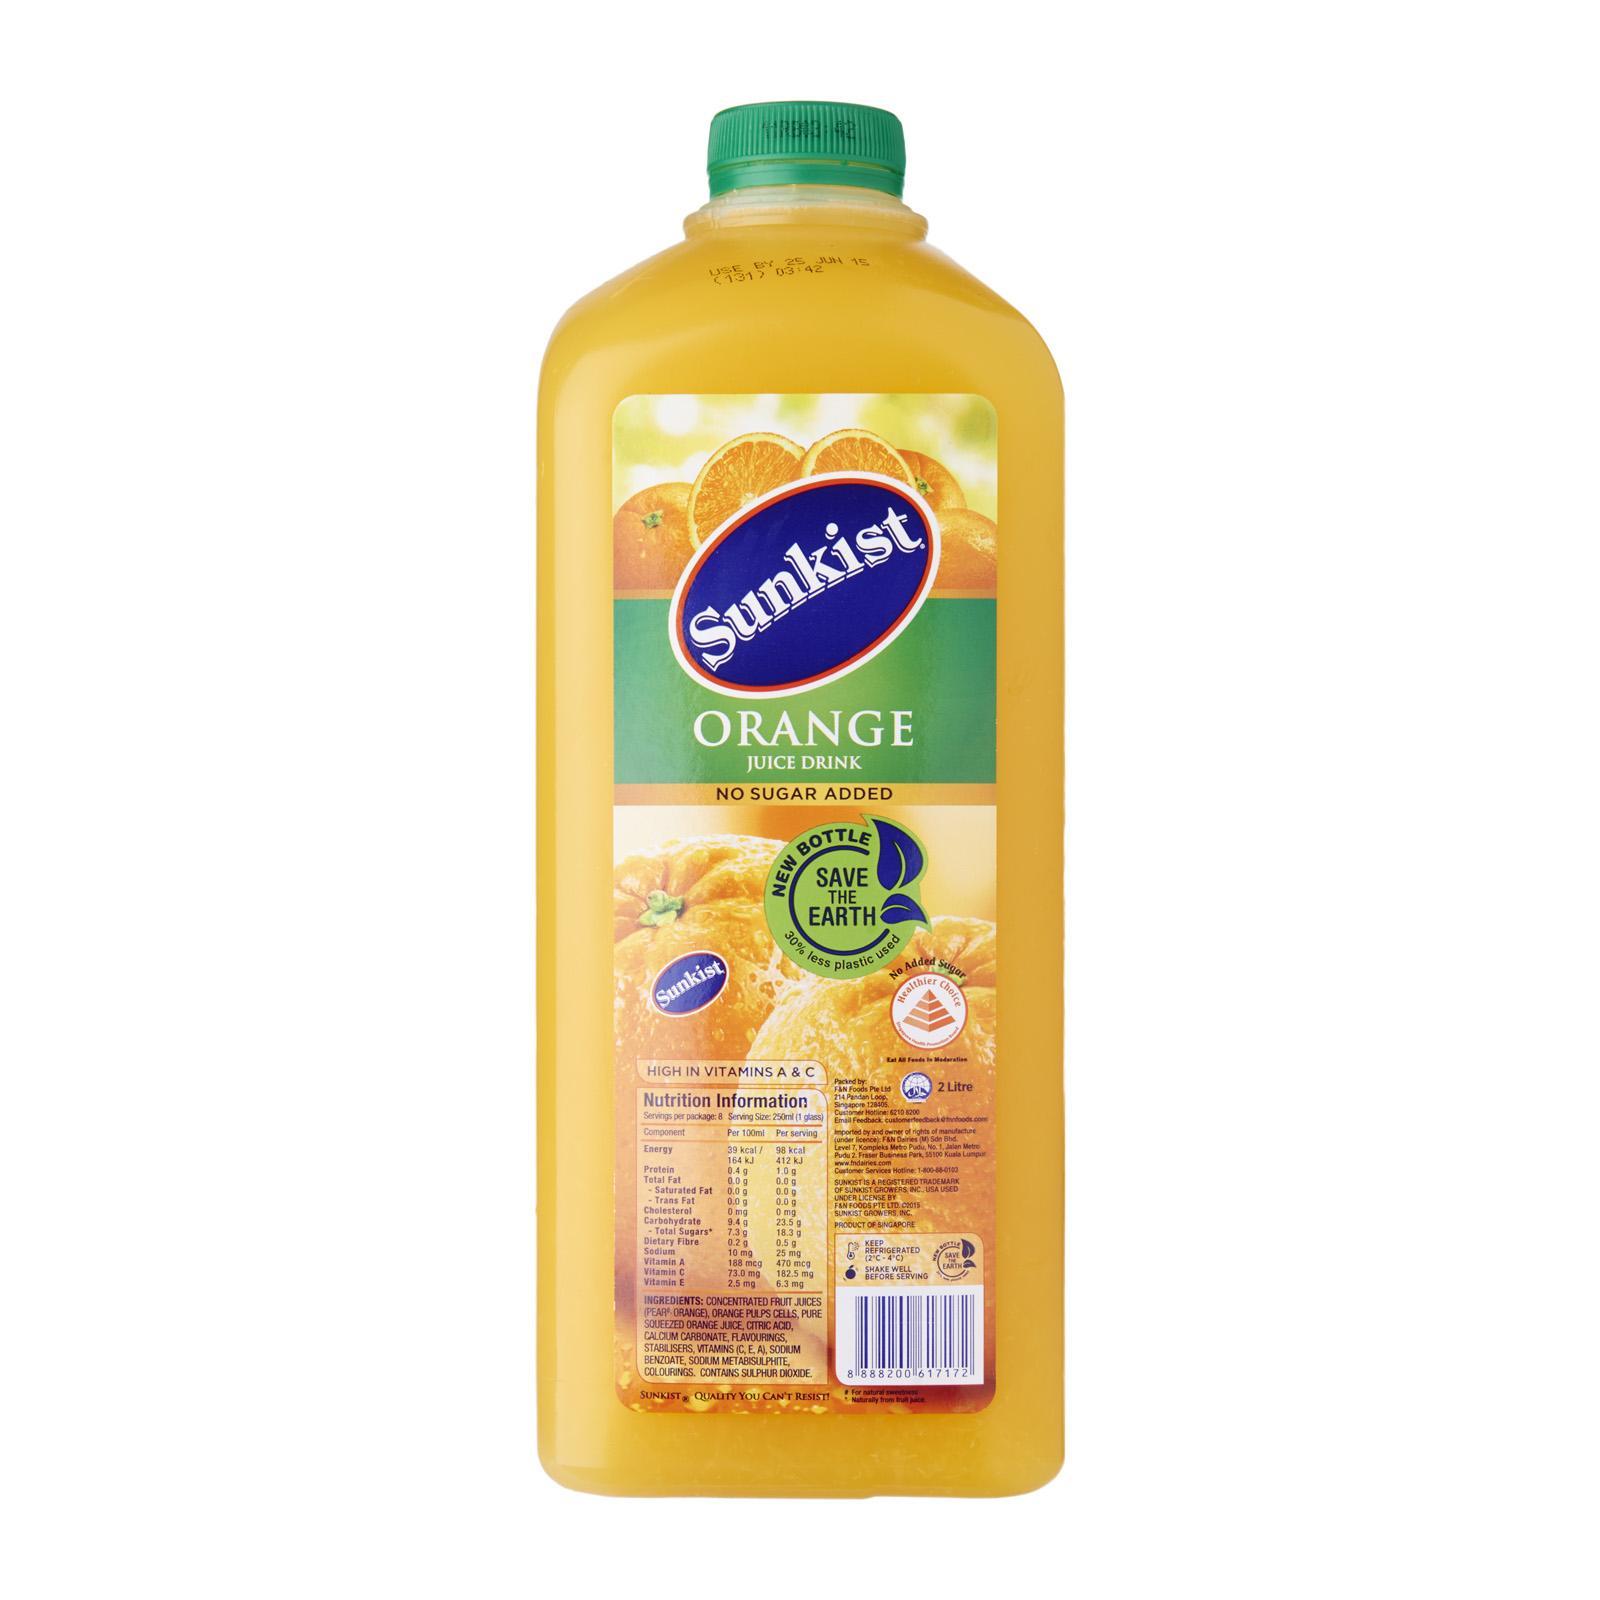 SUNKIST Orange Juice Drink No Sugar Added 2L